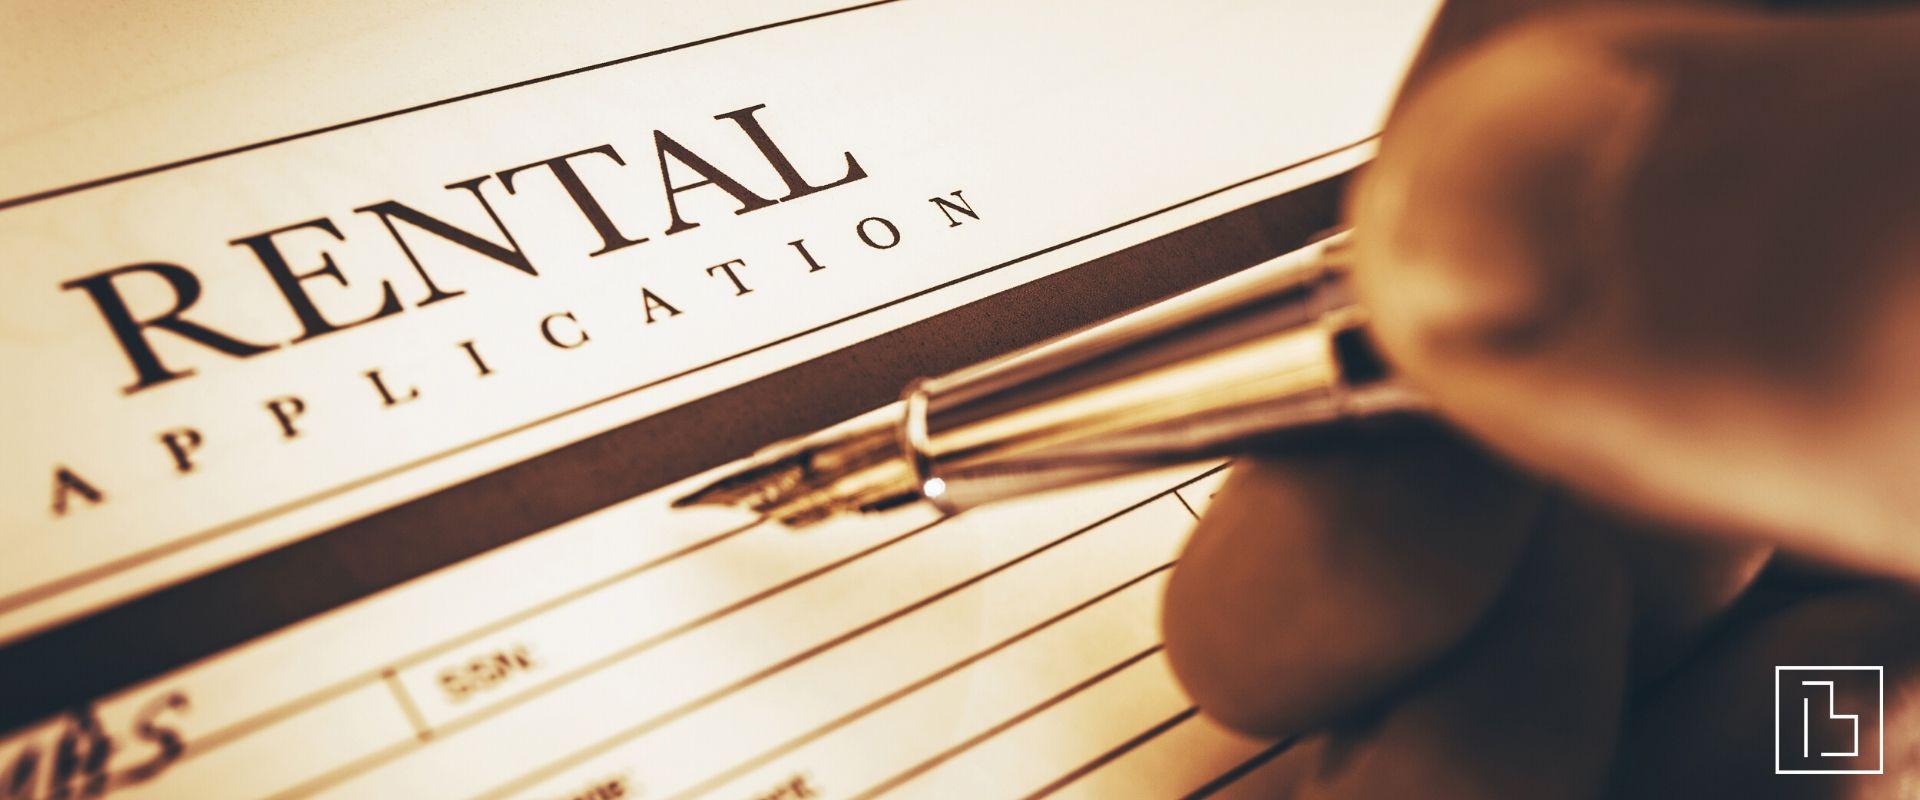 rental law changes splash